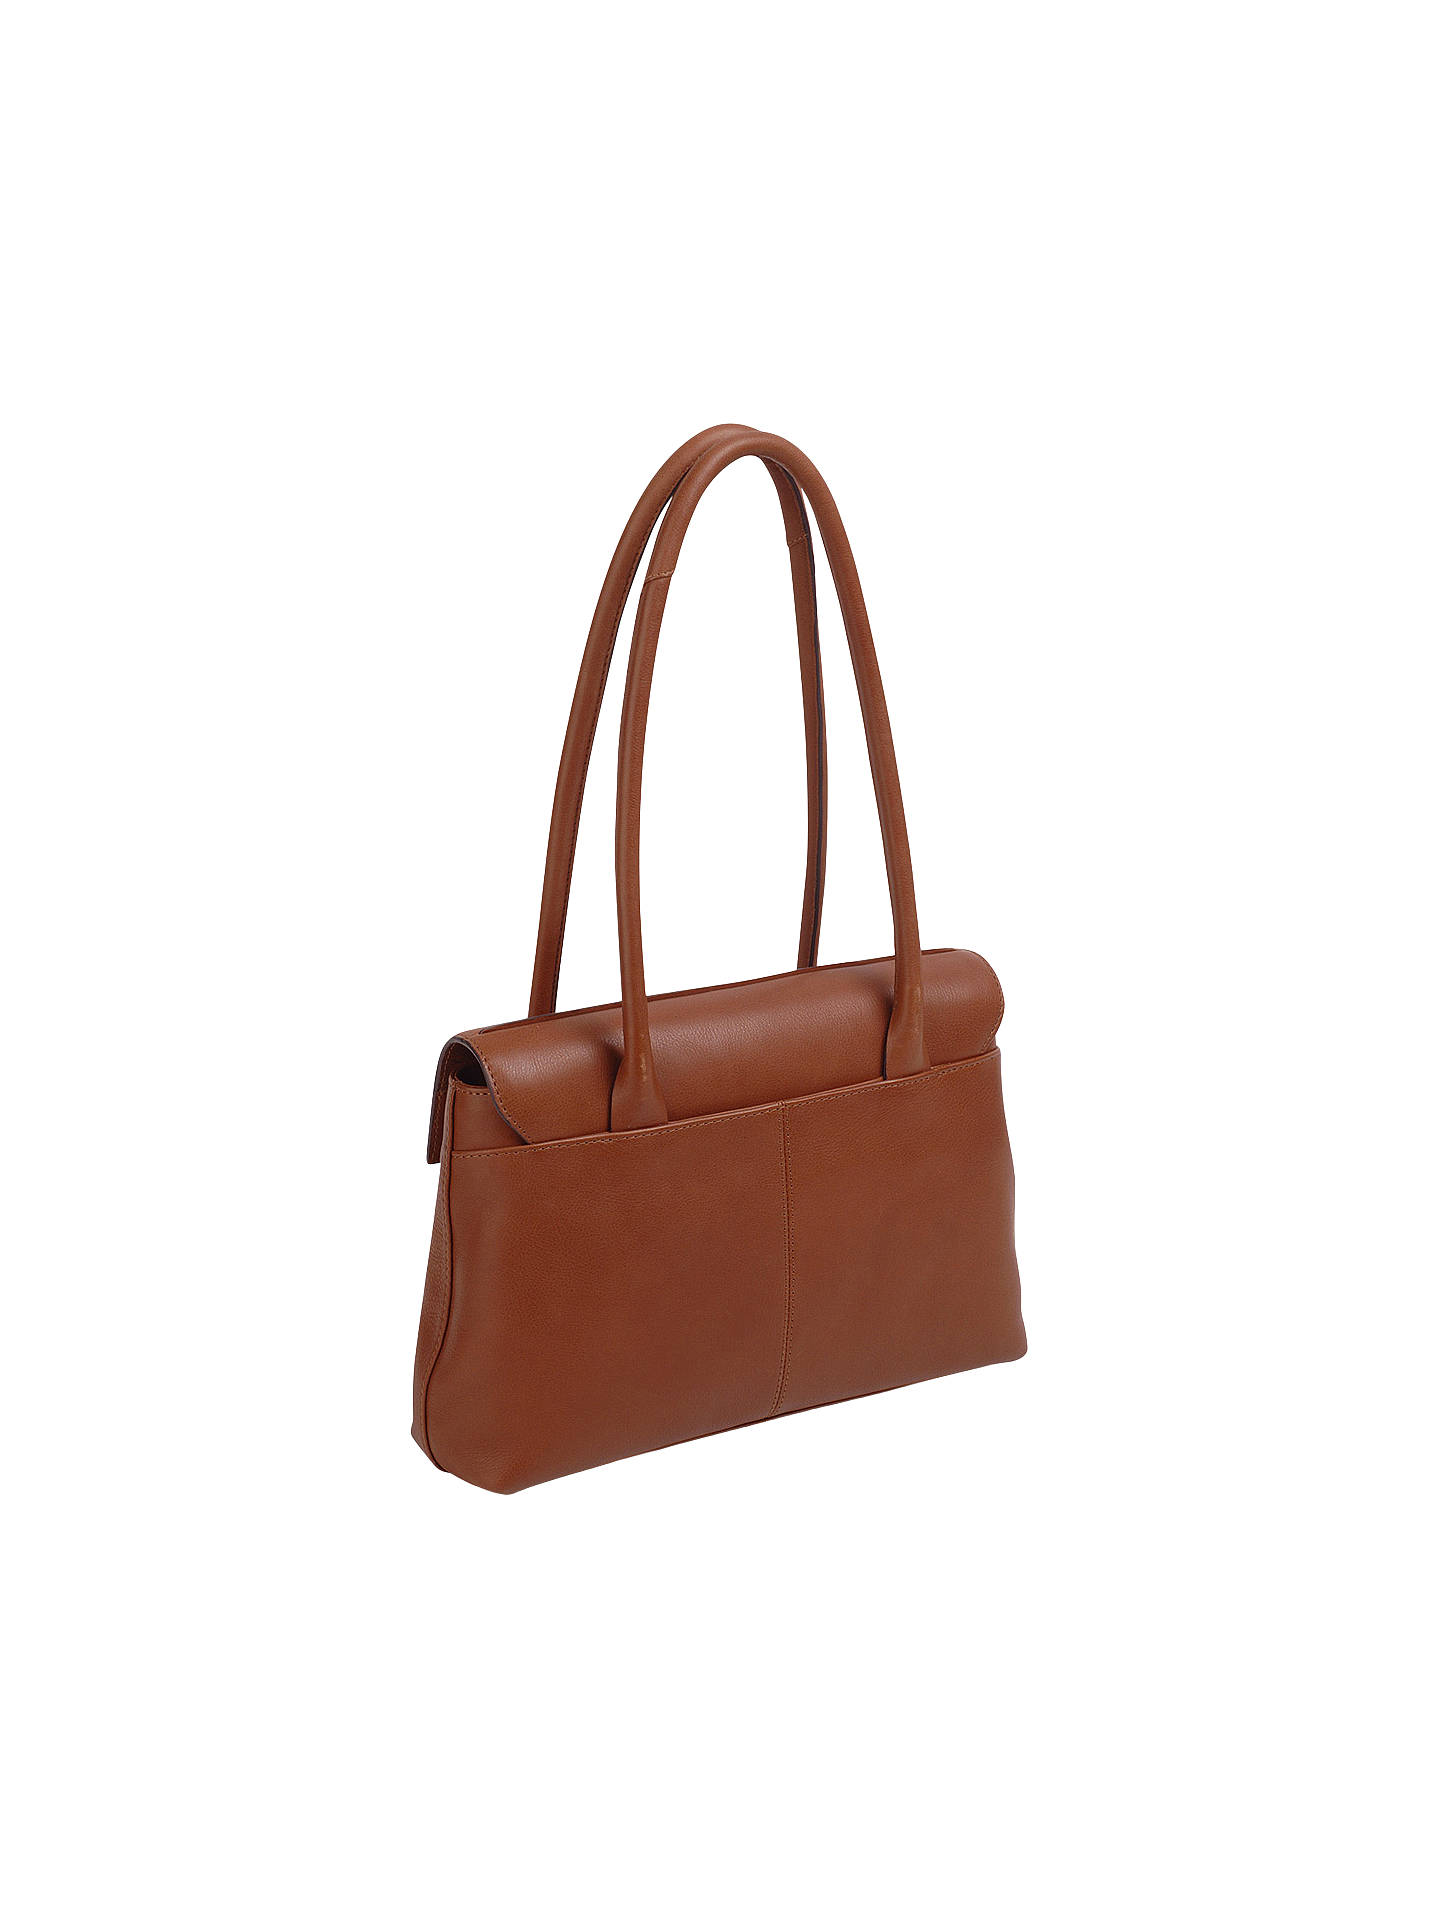 1aa7f1179cbb ... Buy Radley Burnham Beeches Leather Medium Flapover Tote Bag, Tan Online  at johnlewis.com